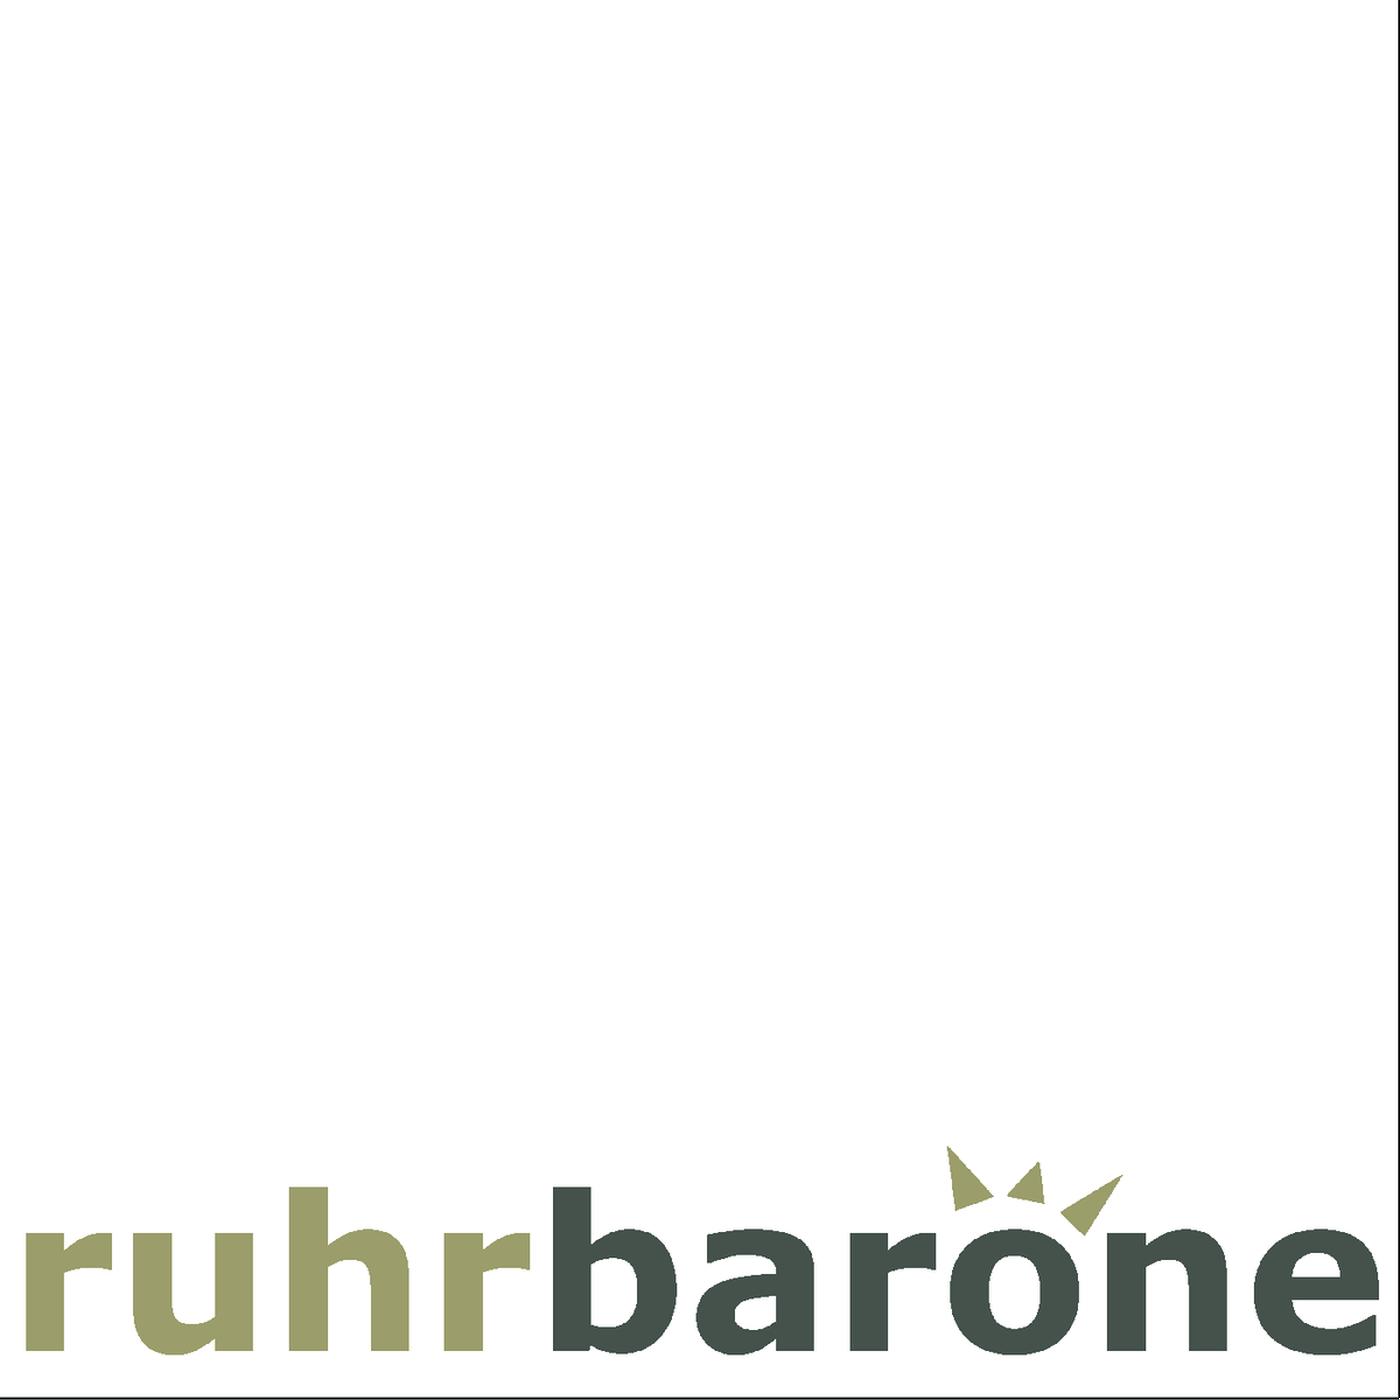 Ruhrbarone